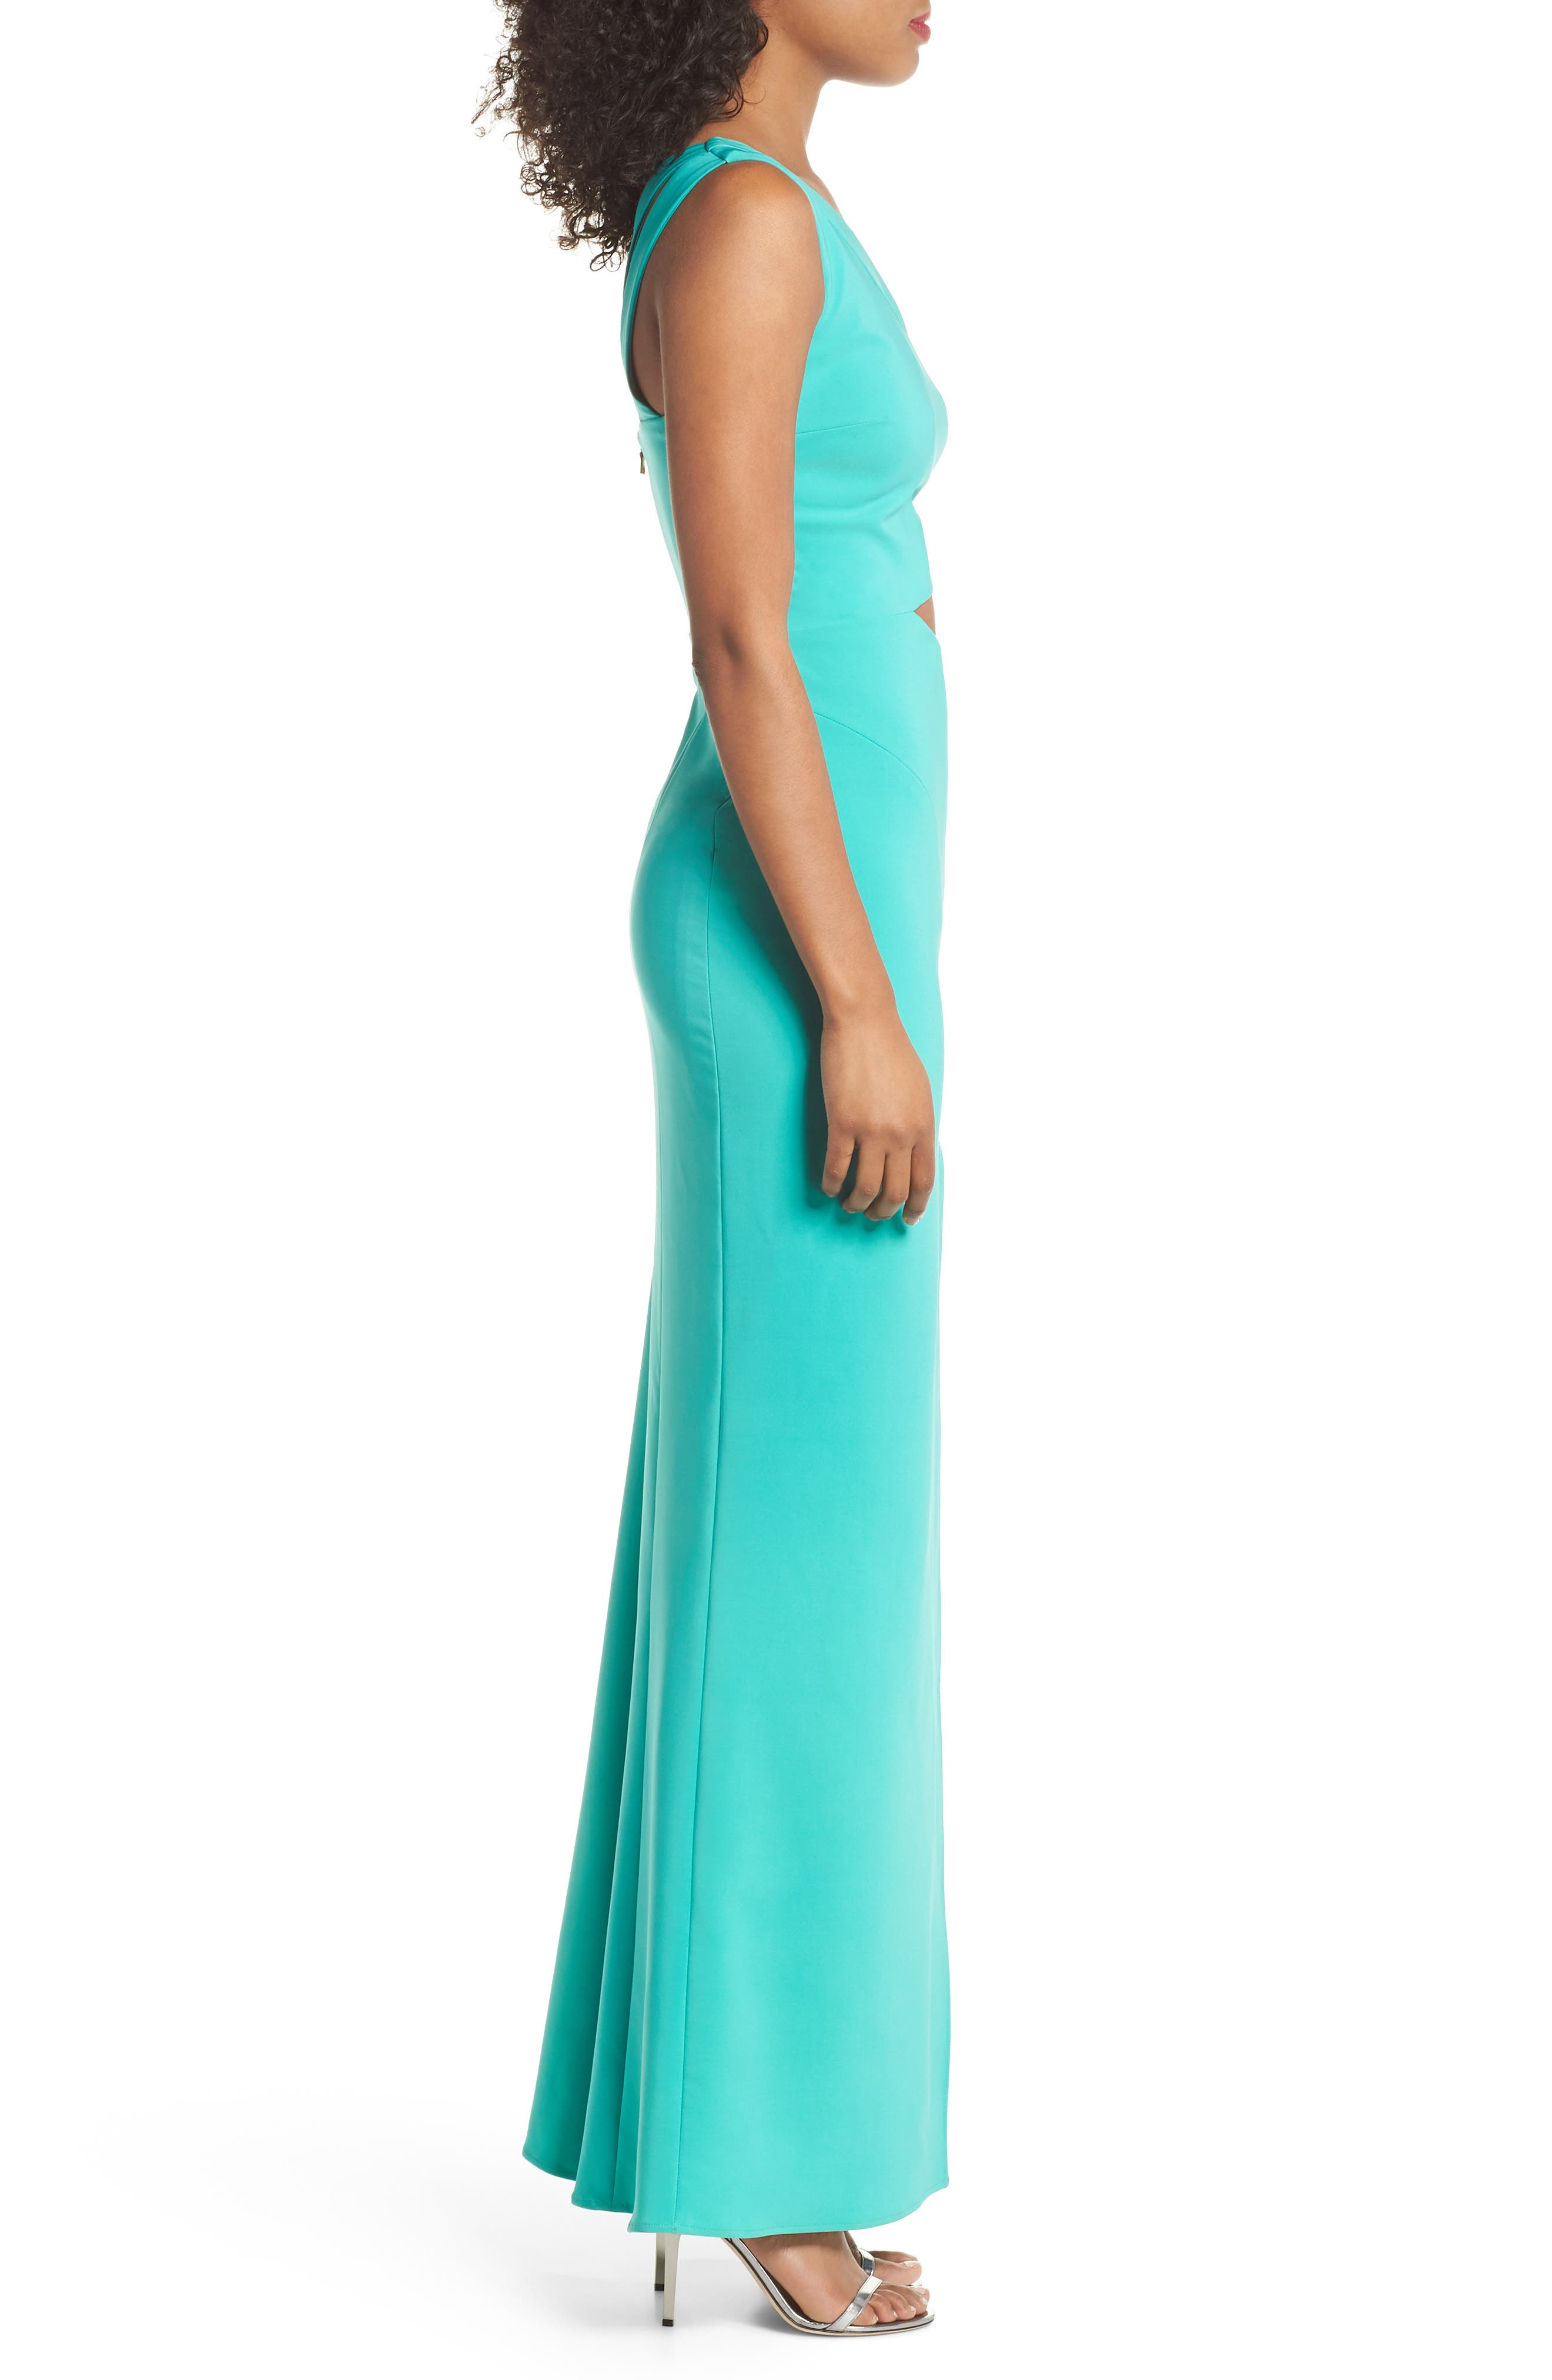 Cameron One-Shoulder Cutout Gown,                             Alternate thumbnail 3, color,                             384